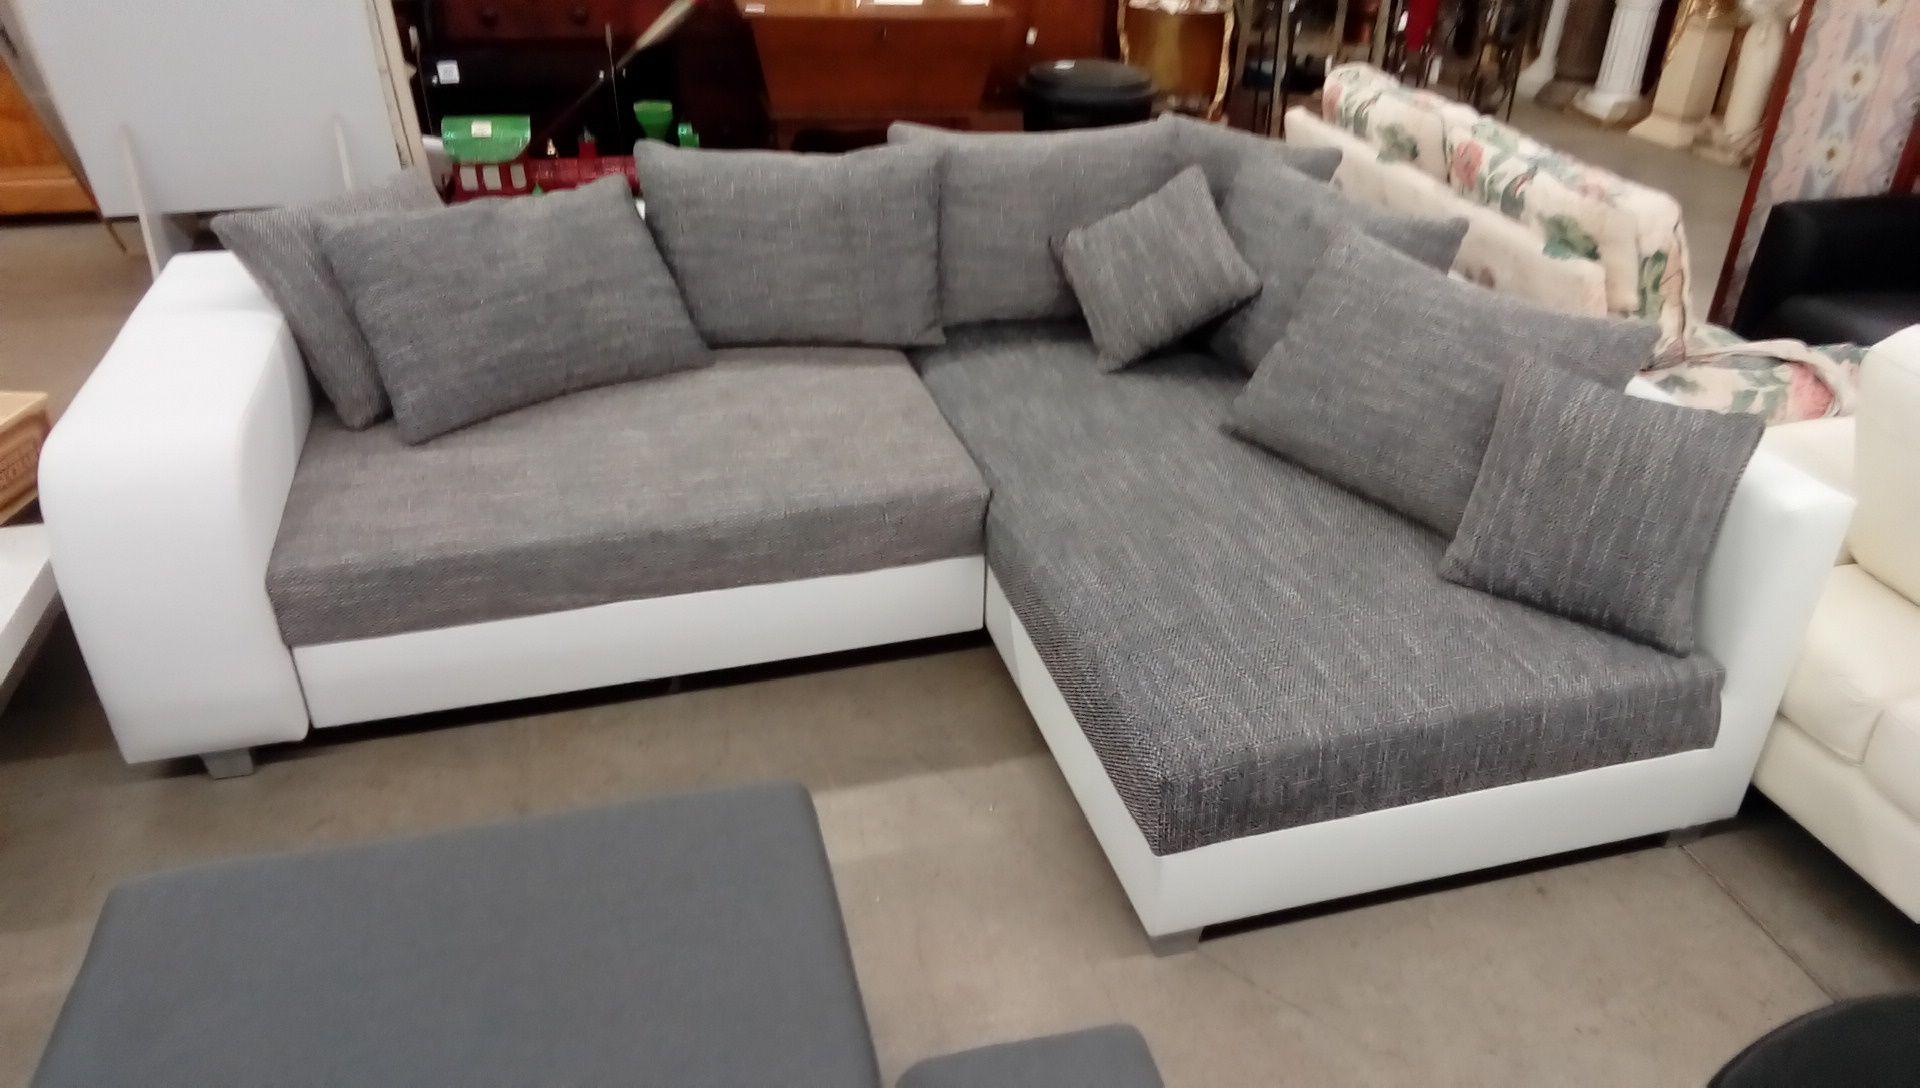 magasin canap nancy magasin de canape cuir pourquoi. Black Bedroom Furniture Sets. Home Design Ideas